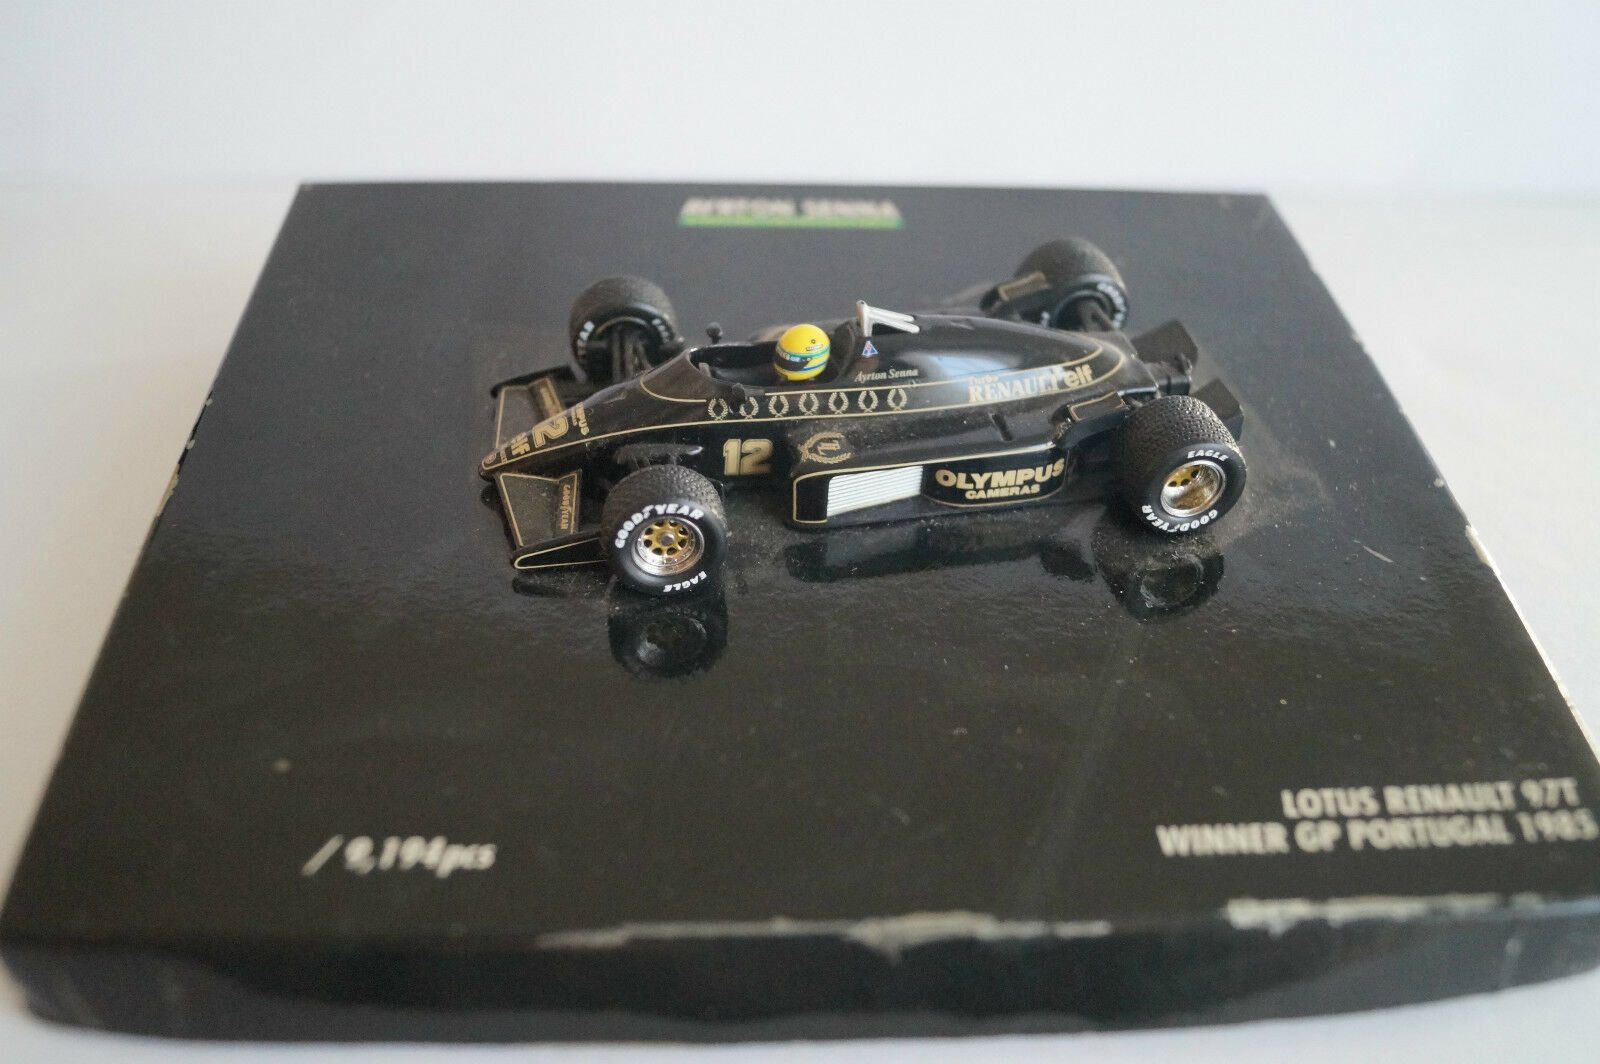 Voiture  miniature 1 43 Lotus renault 97t winner GP portugal 1985 Ayrton senna  être en grande demande